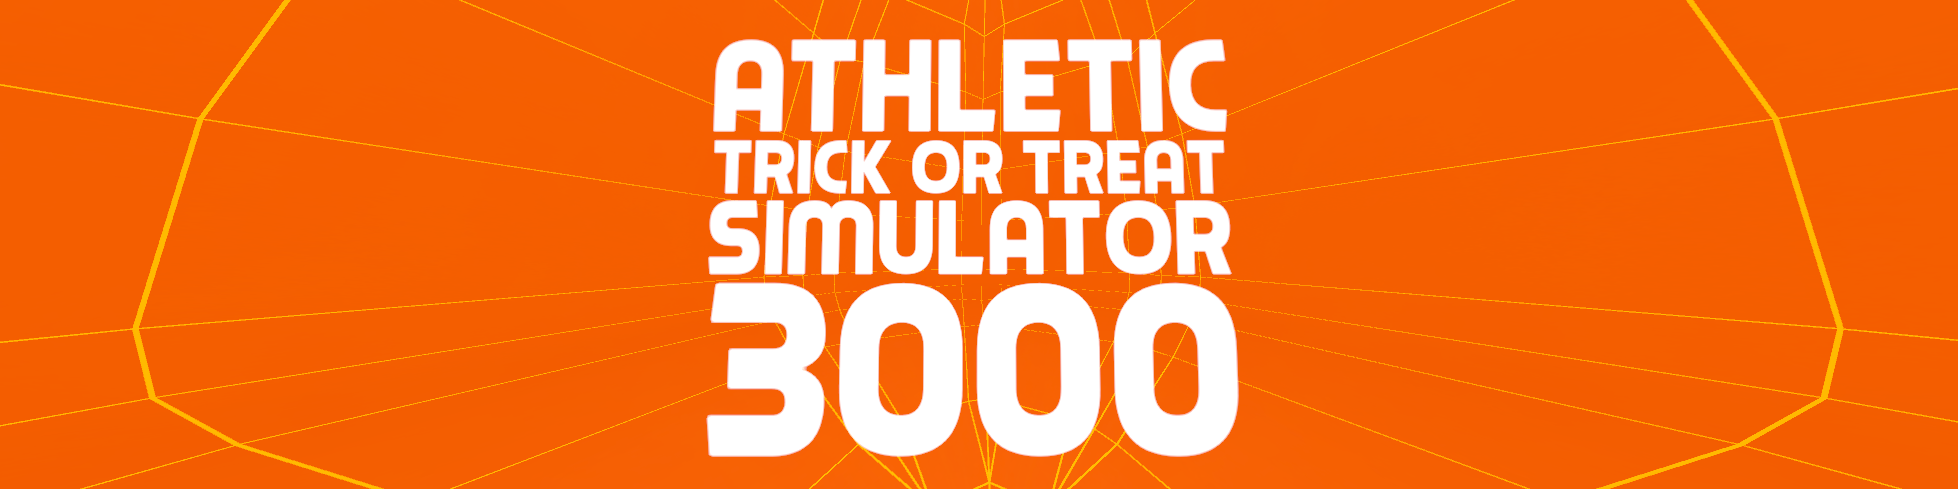 Athletic Trick-Or-Treat Simulator 3000 (VR)